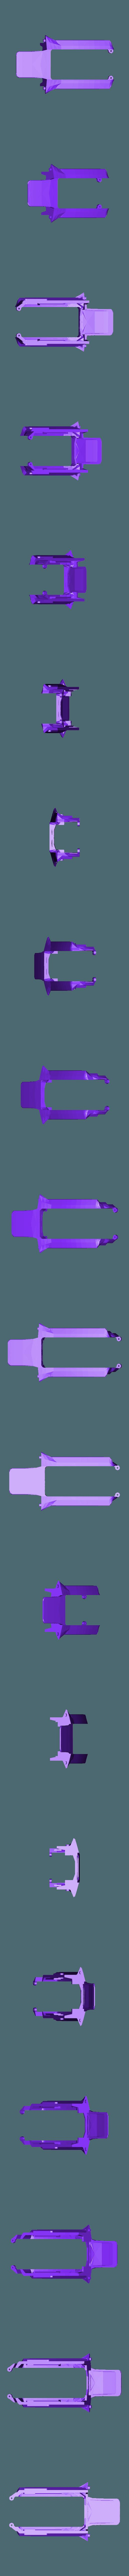 cover_b.stl Download free STL file Foldable drone frame (Mavic look like, body & head alternative) Remix • 3D printer model, mwilmars